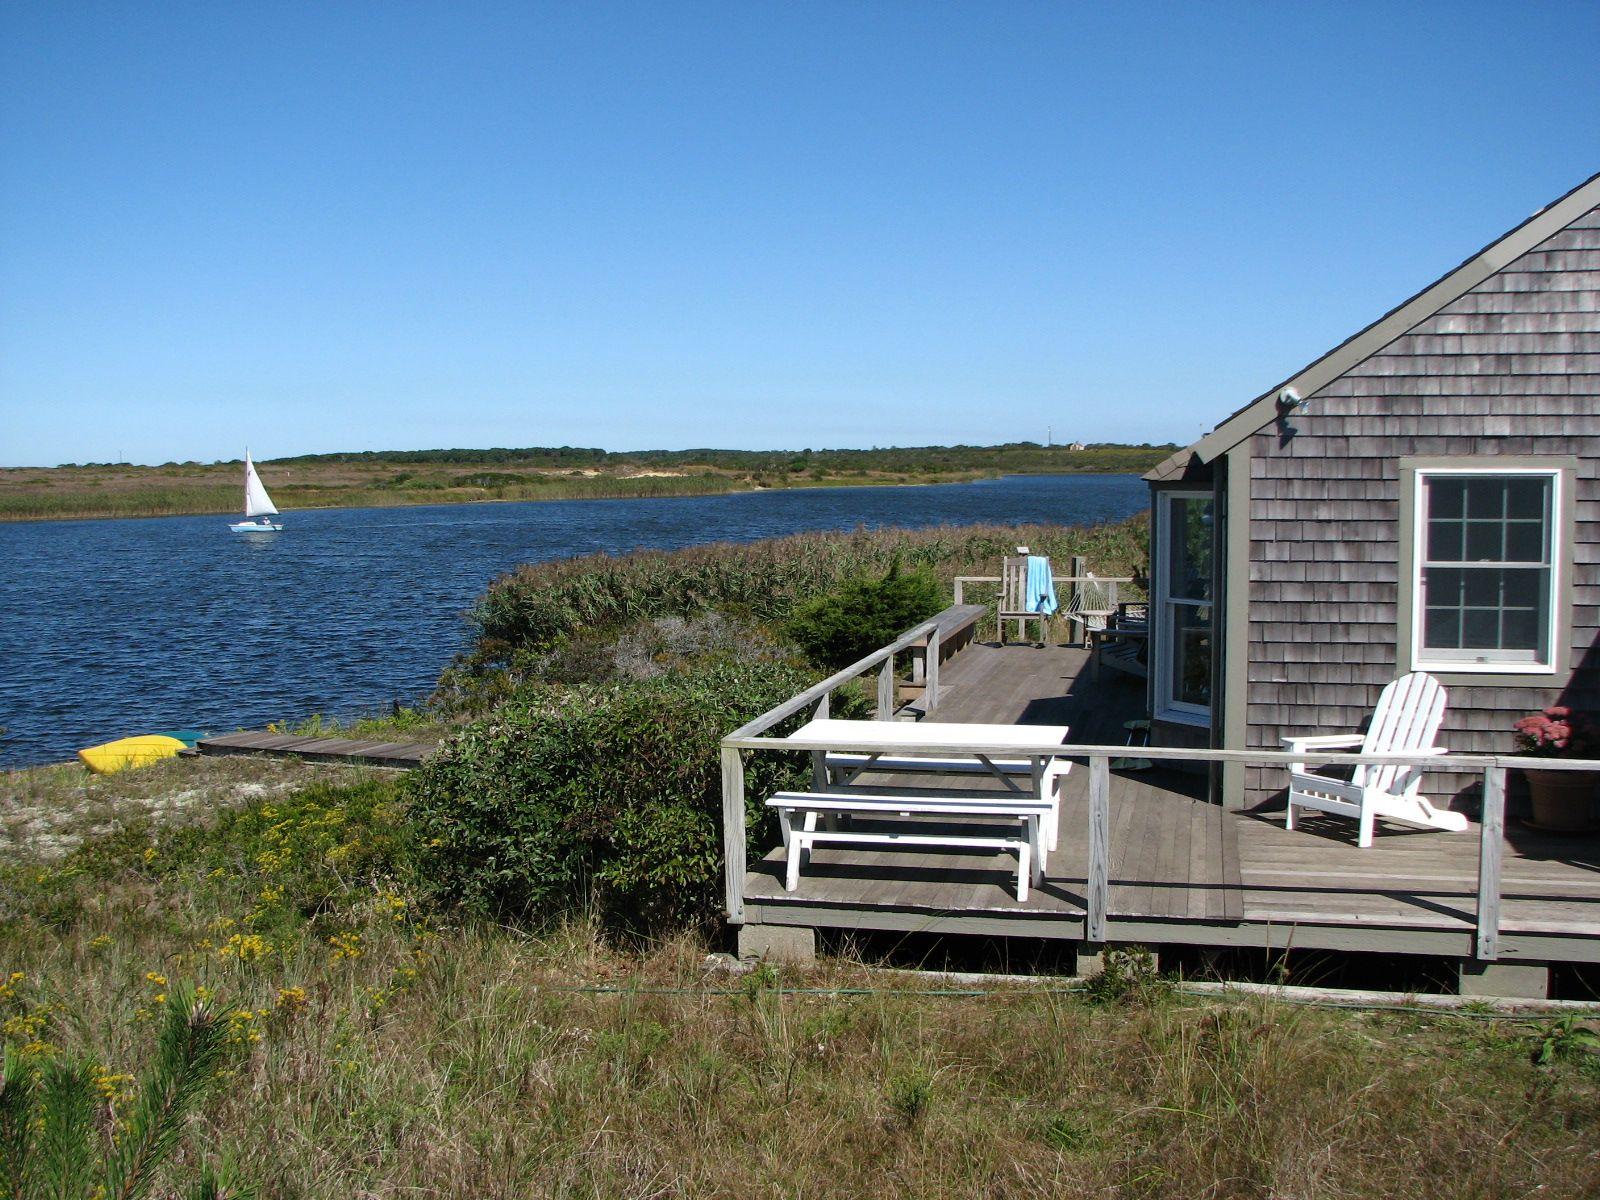 Our Nantucket cottage, Bufflehead